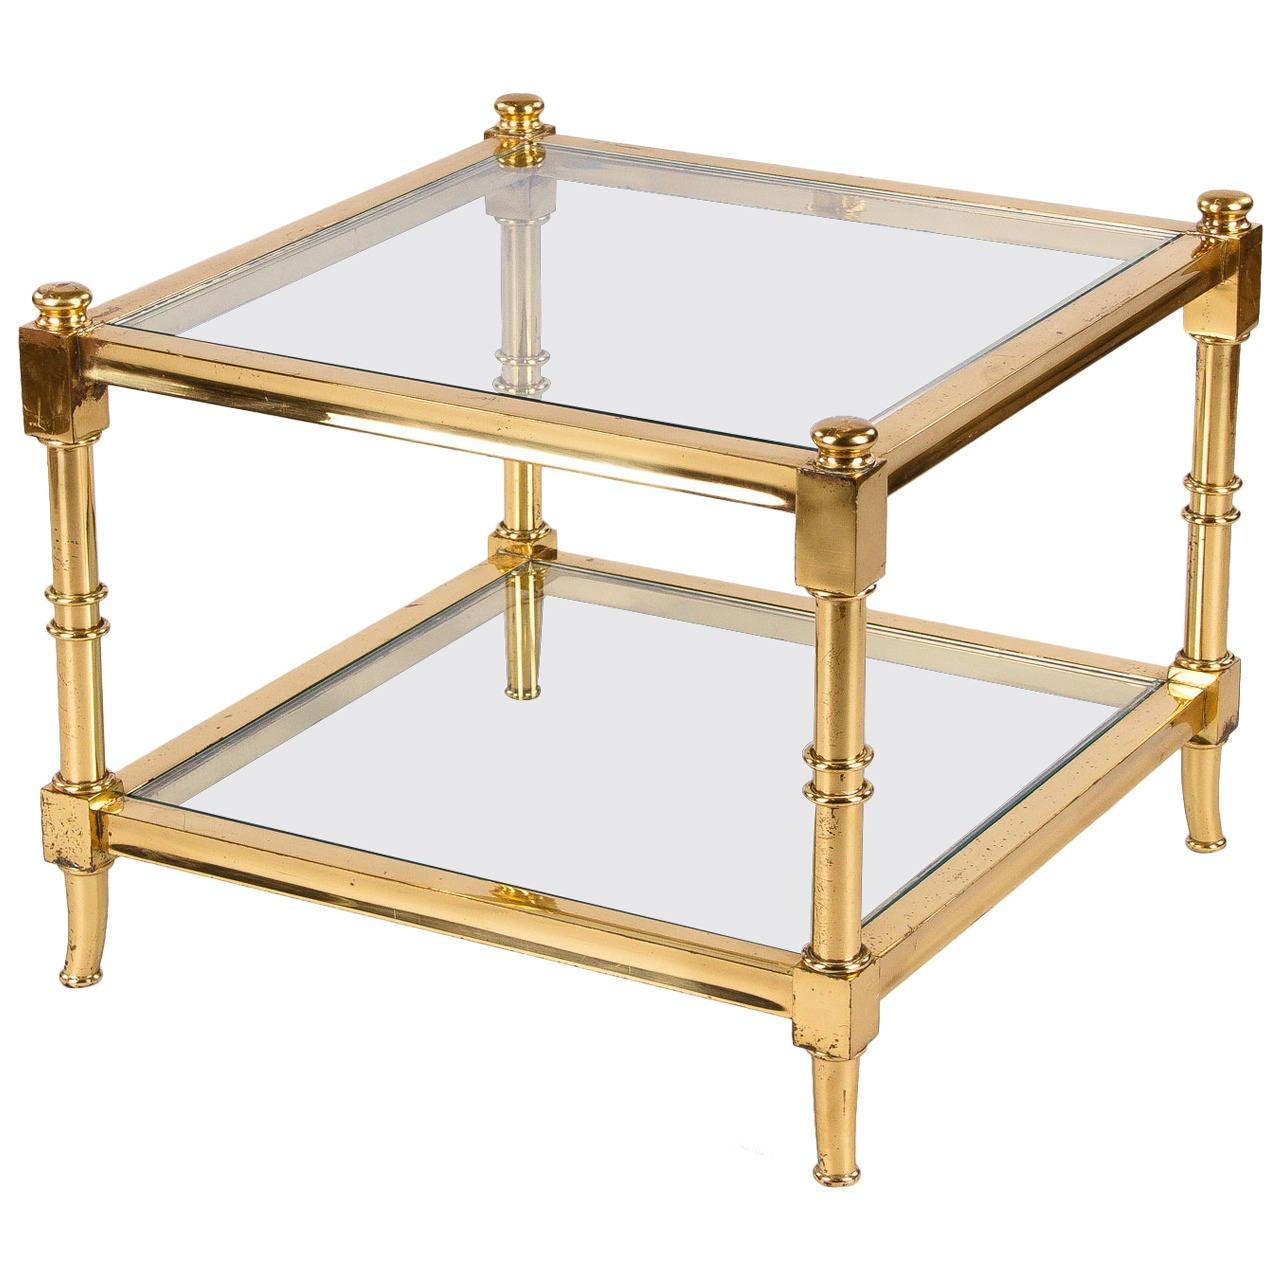 1960s Maison Jansen Style Brass Side Table